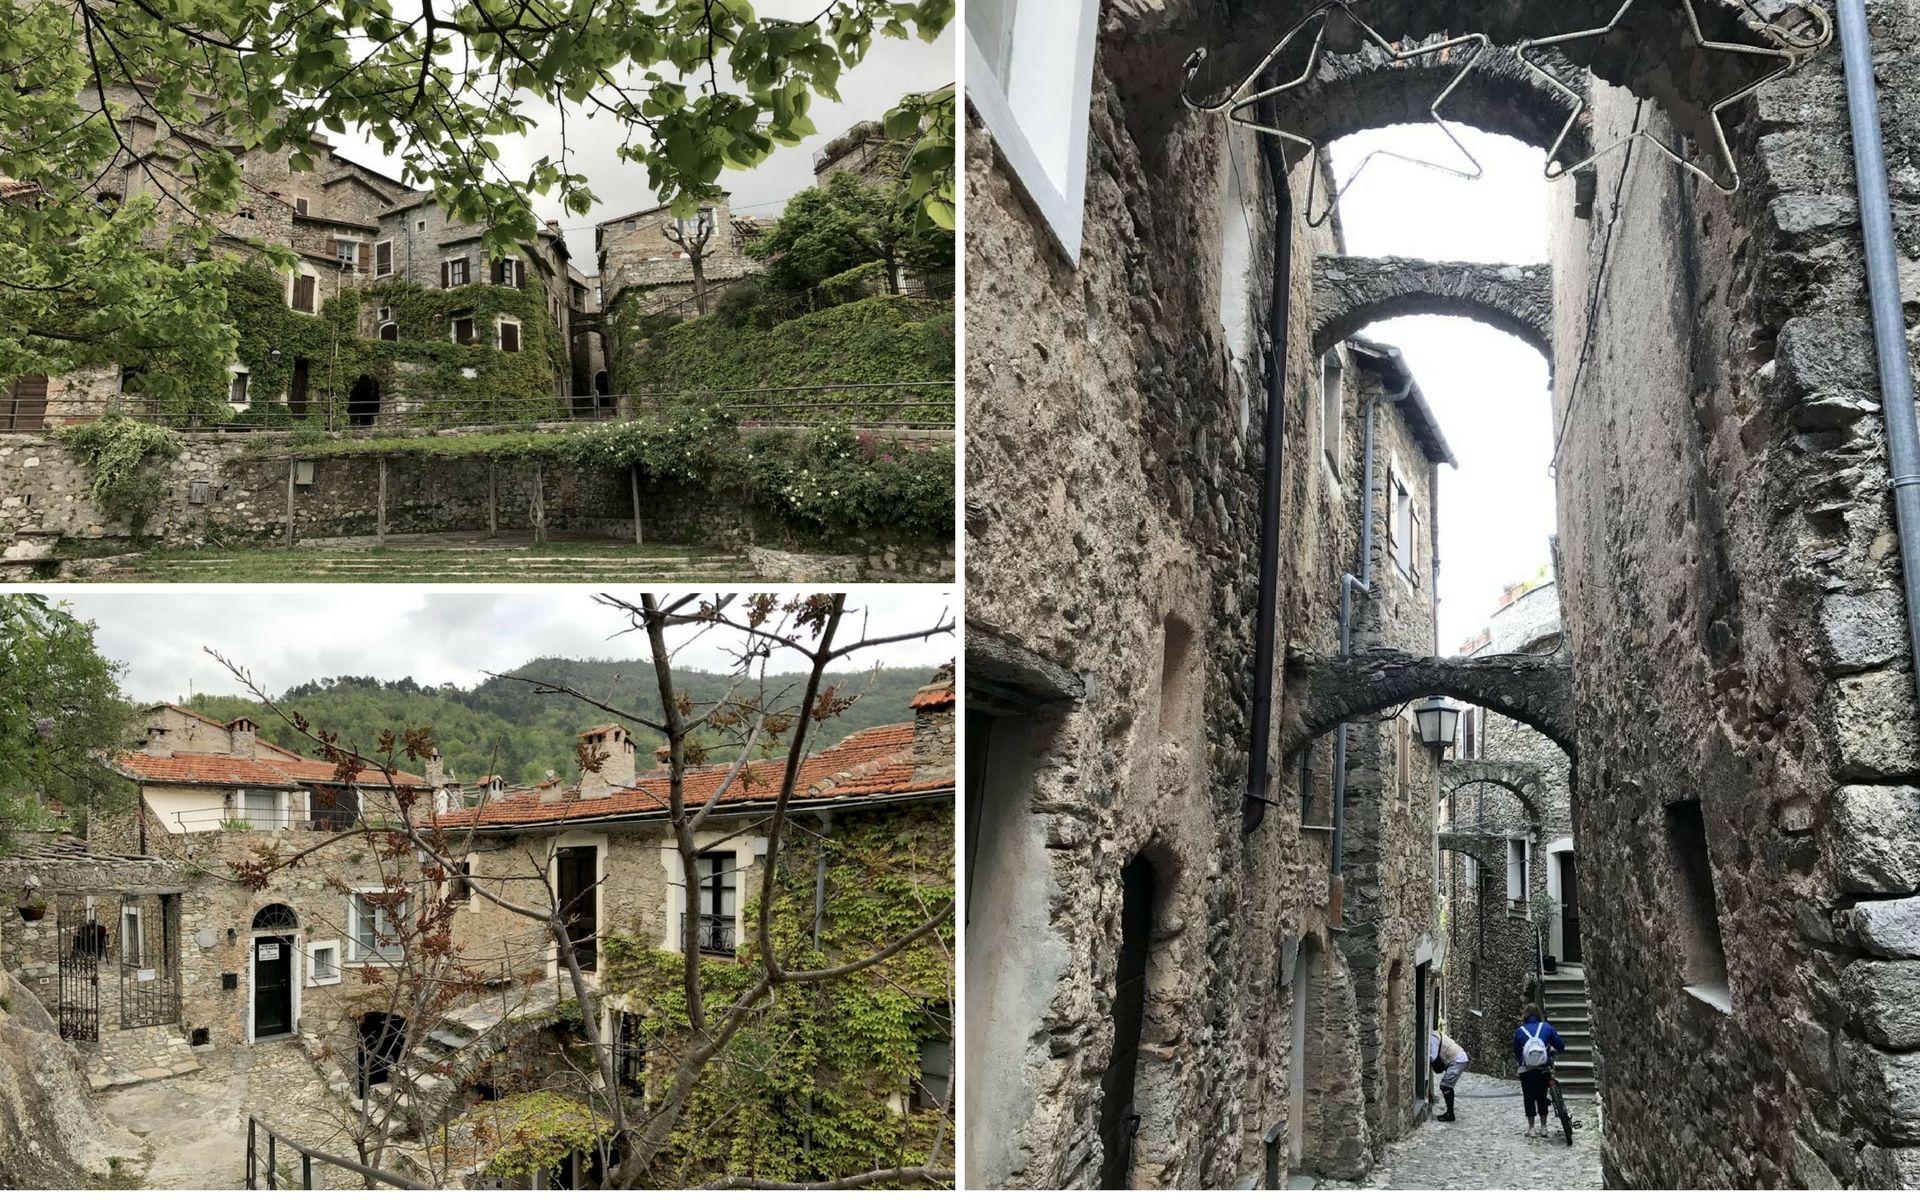 le strette vie di Castelvecchio